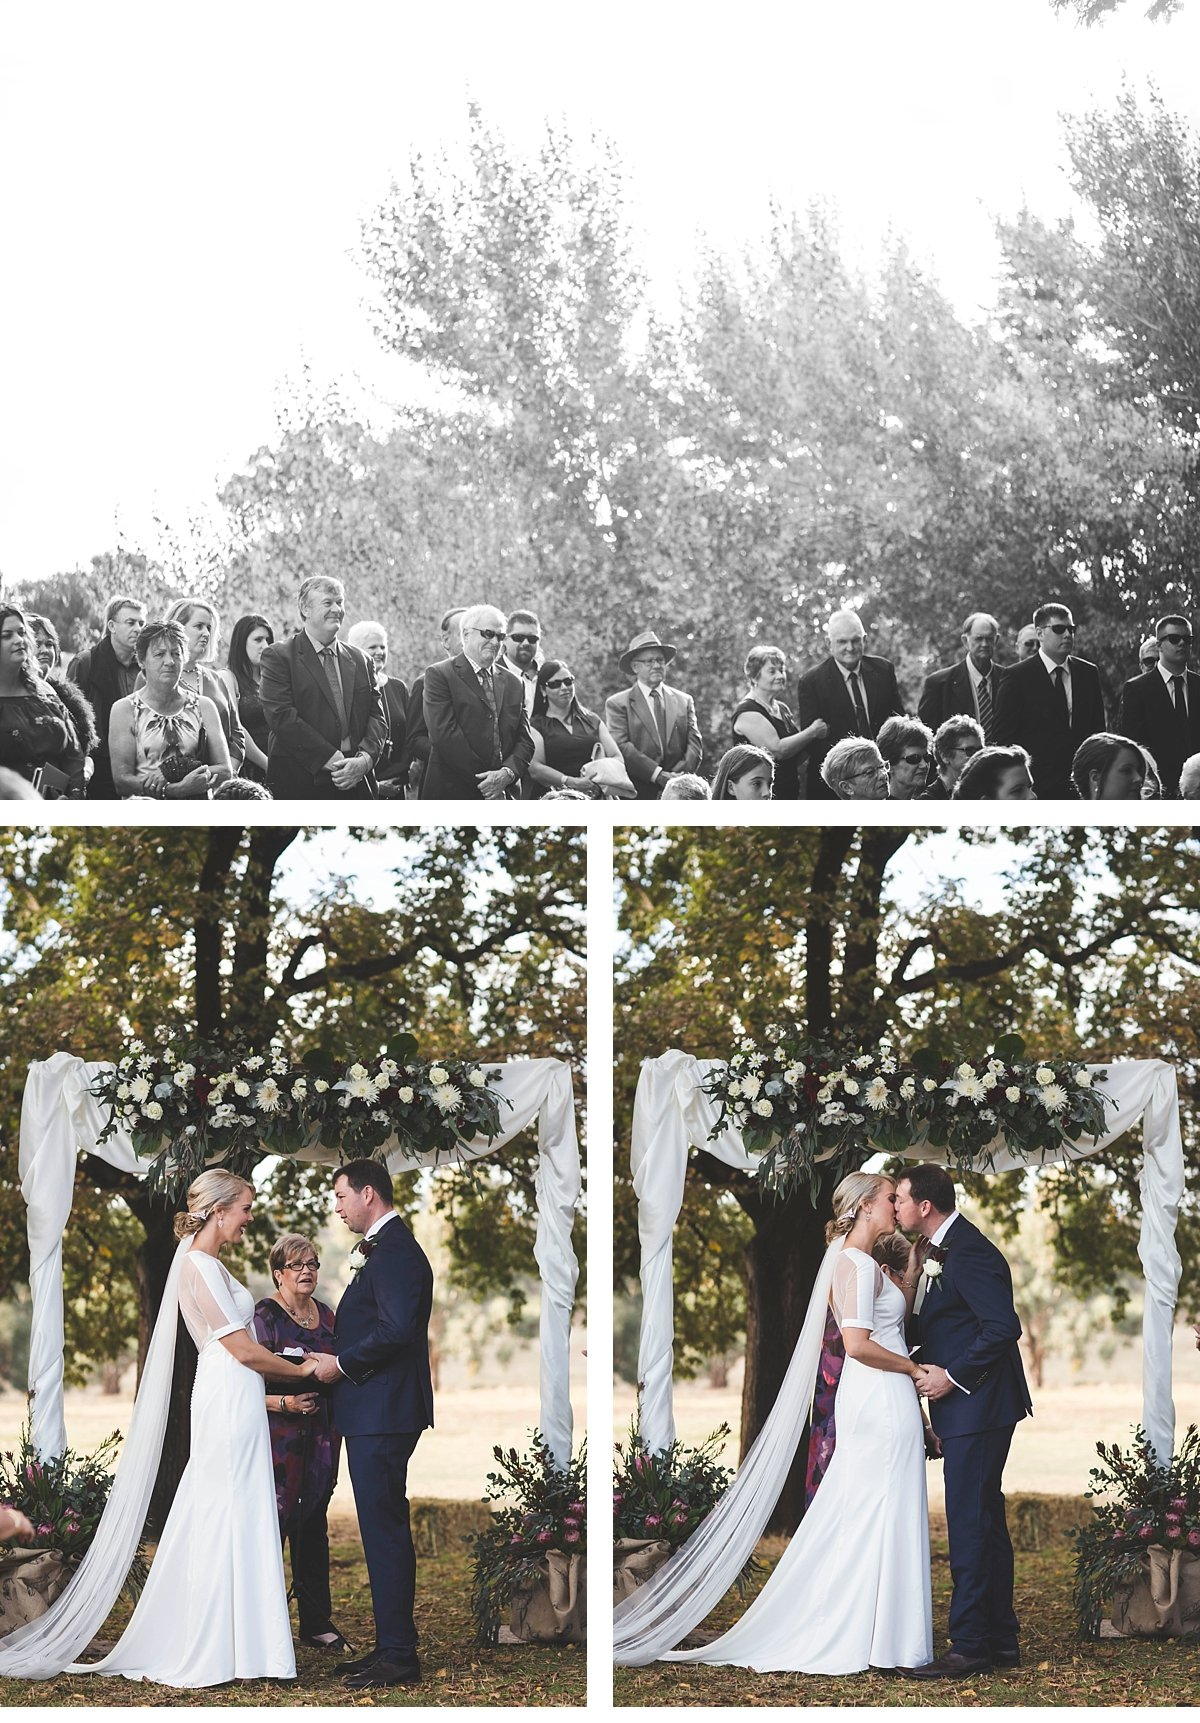 Burandana Hall wedding by Wagga Wagga Wedding Photographer Peppermint Studios_St Michaels Cathedral Wagga_Deniliquin weddings_0167